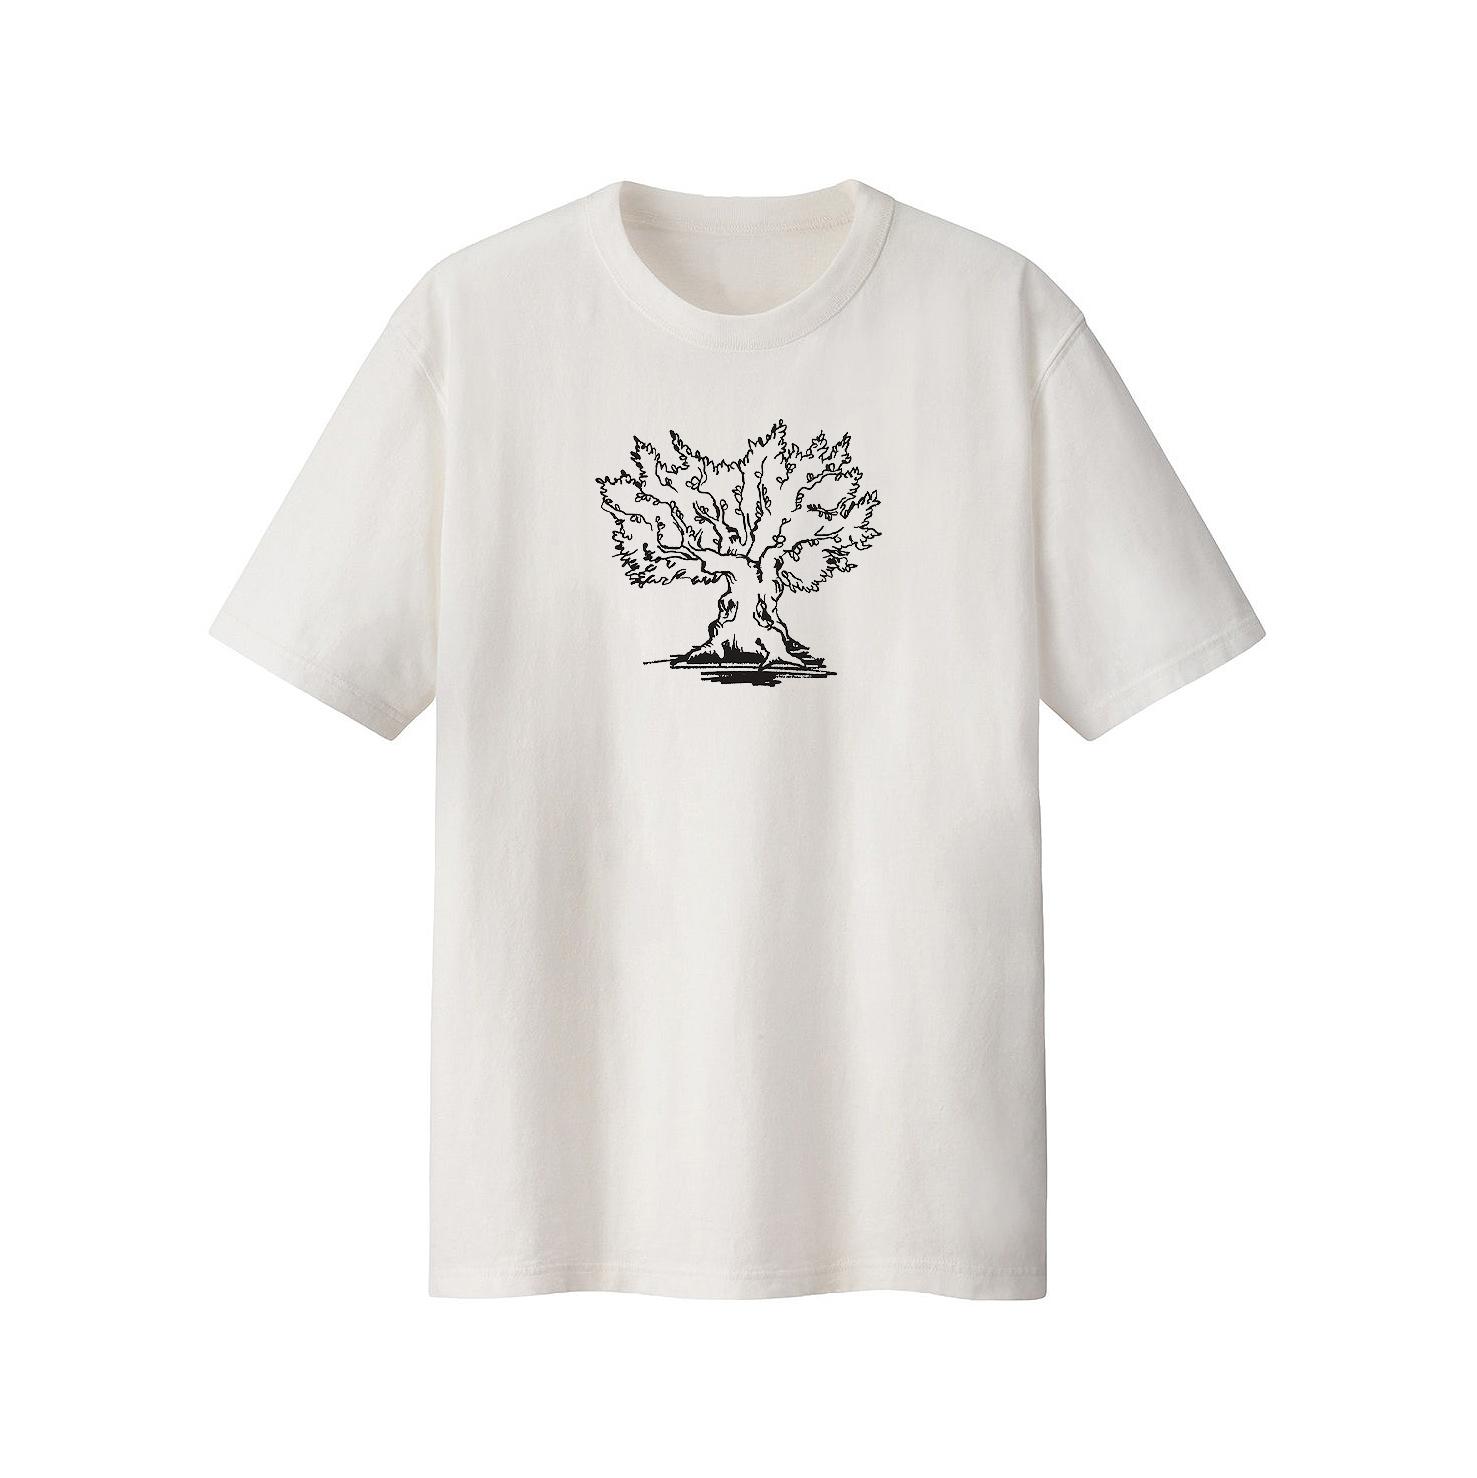 Jalil Peraza Axel Olson Shirt Embroidered Illustration